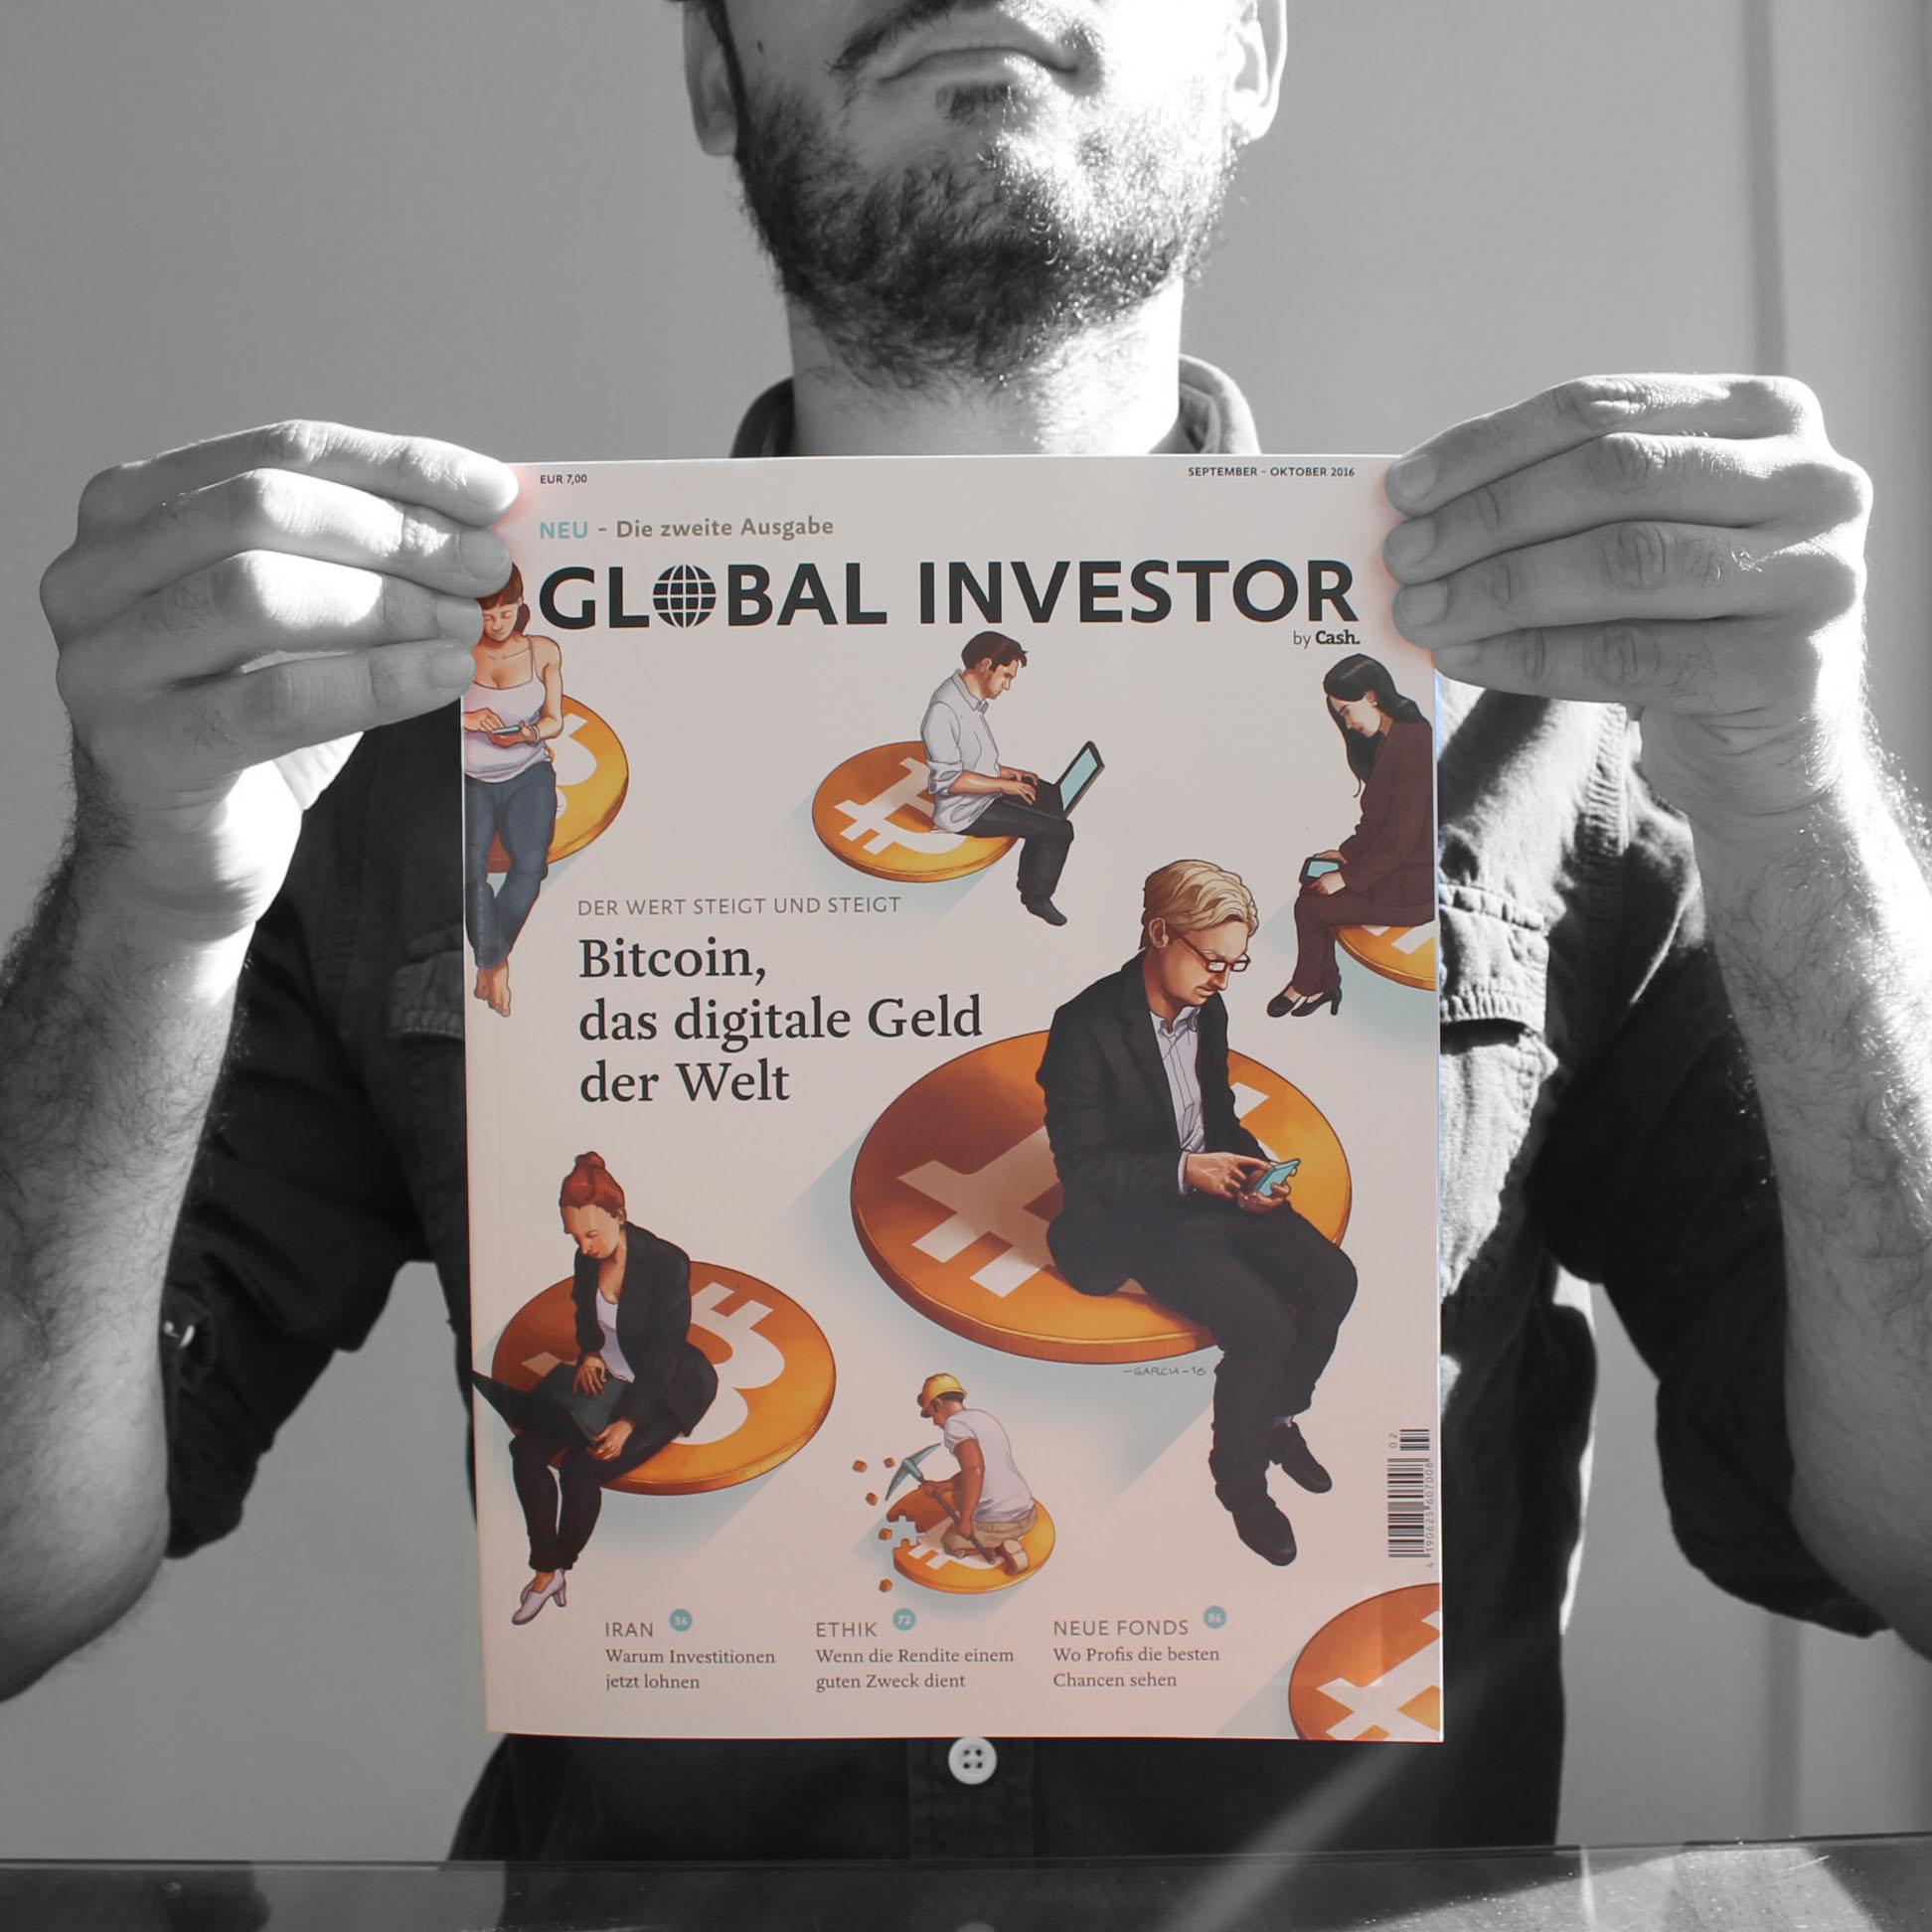 daniel-garcia-art-illustration-global-investor-cash-bitcoin-editorial-02